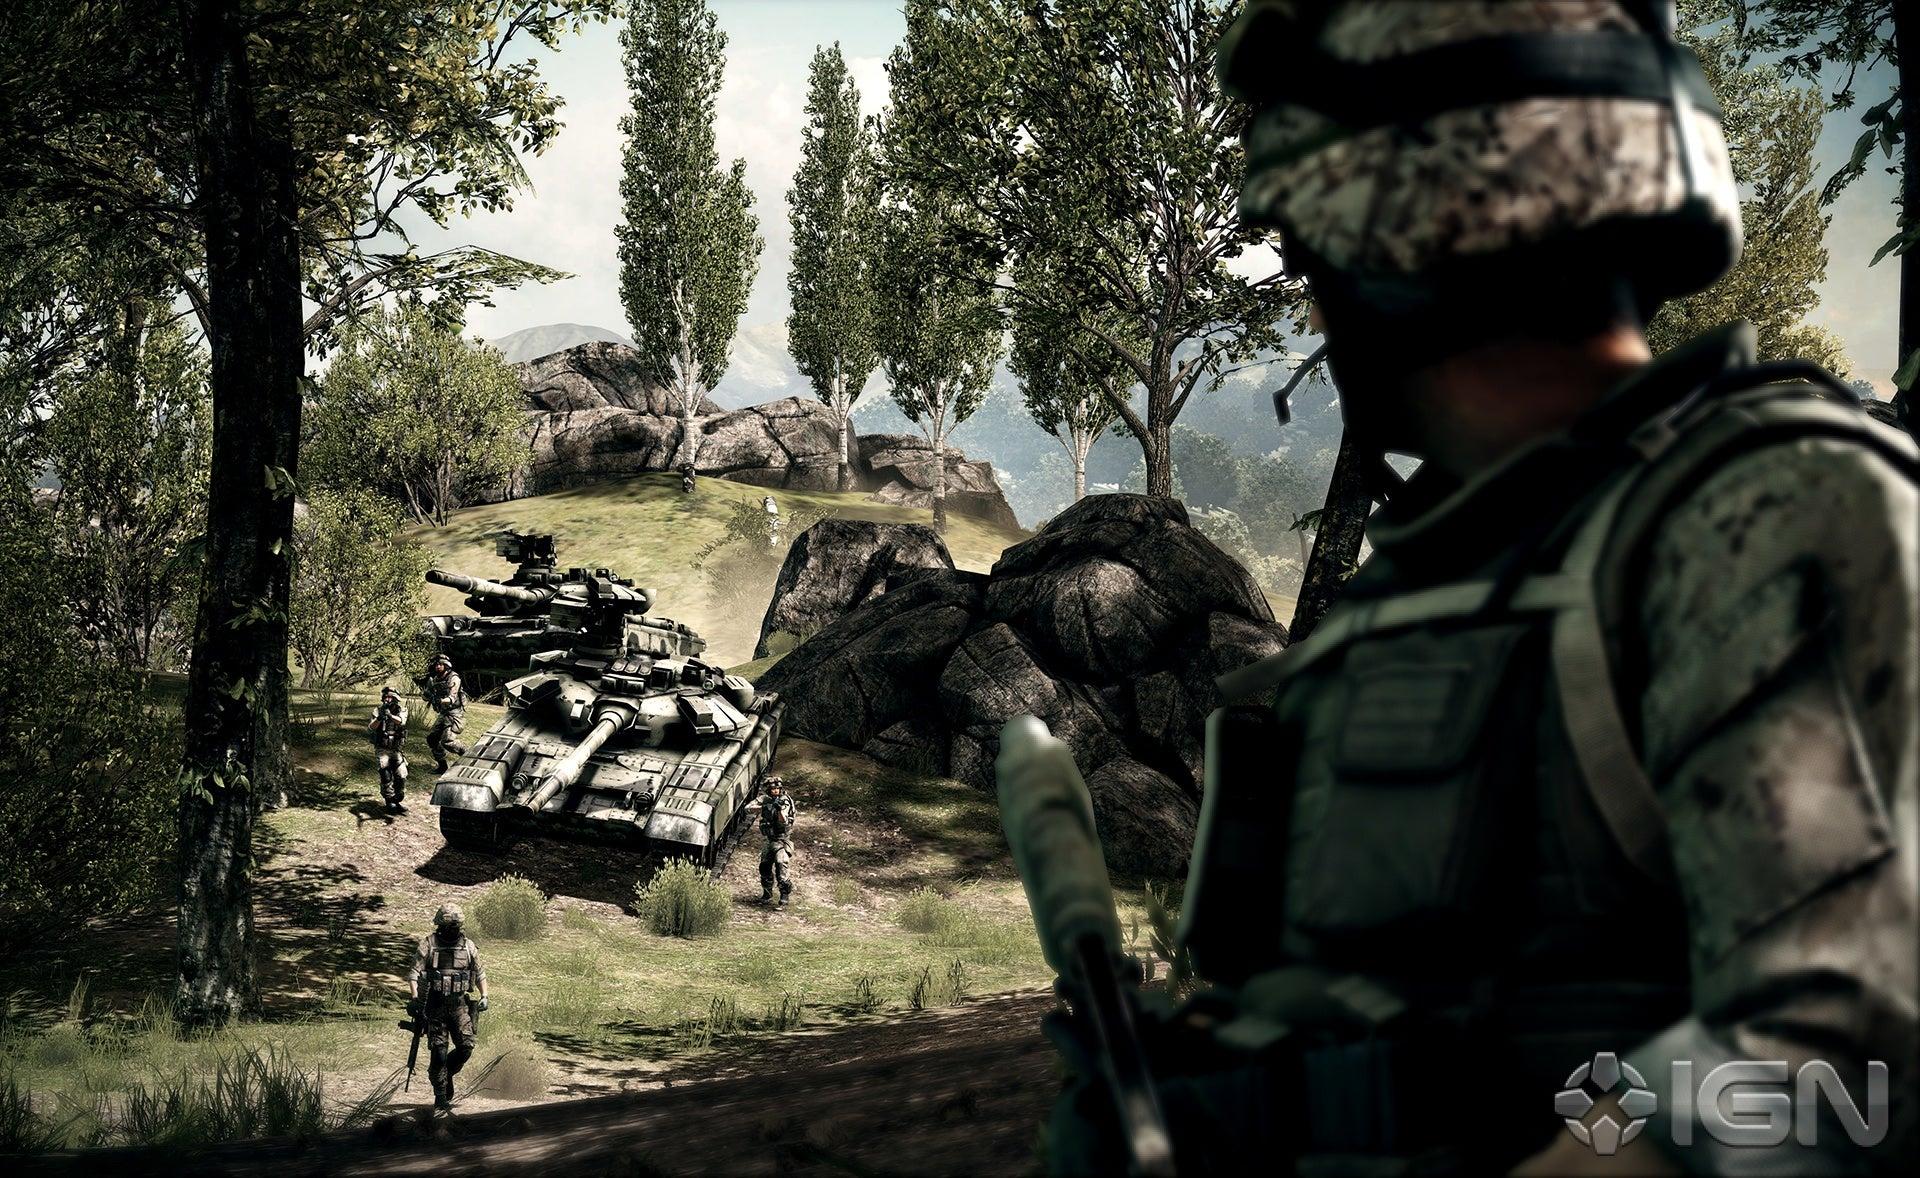 https://i0.wp.com/pcmedia.ign.com/pc/image/article/119/1194679/battlefield-3-20110915101732724.jpg